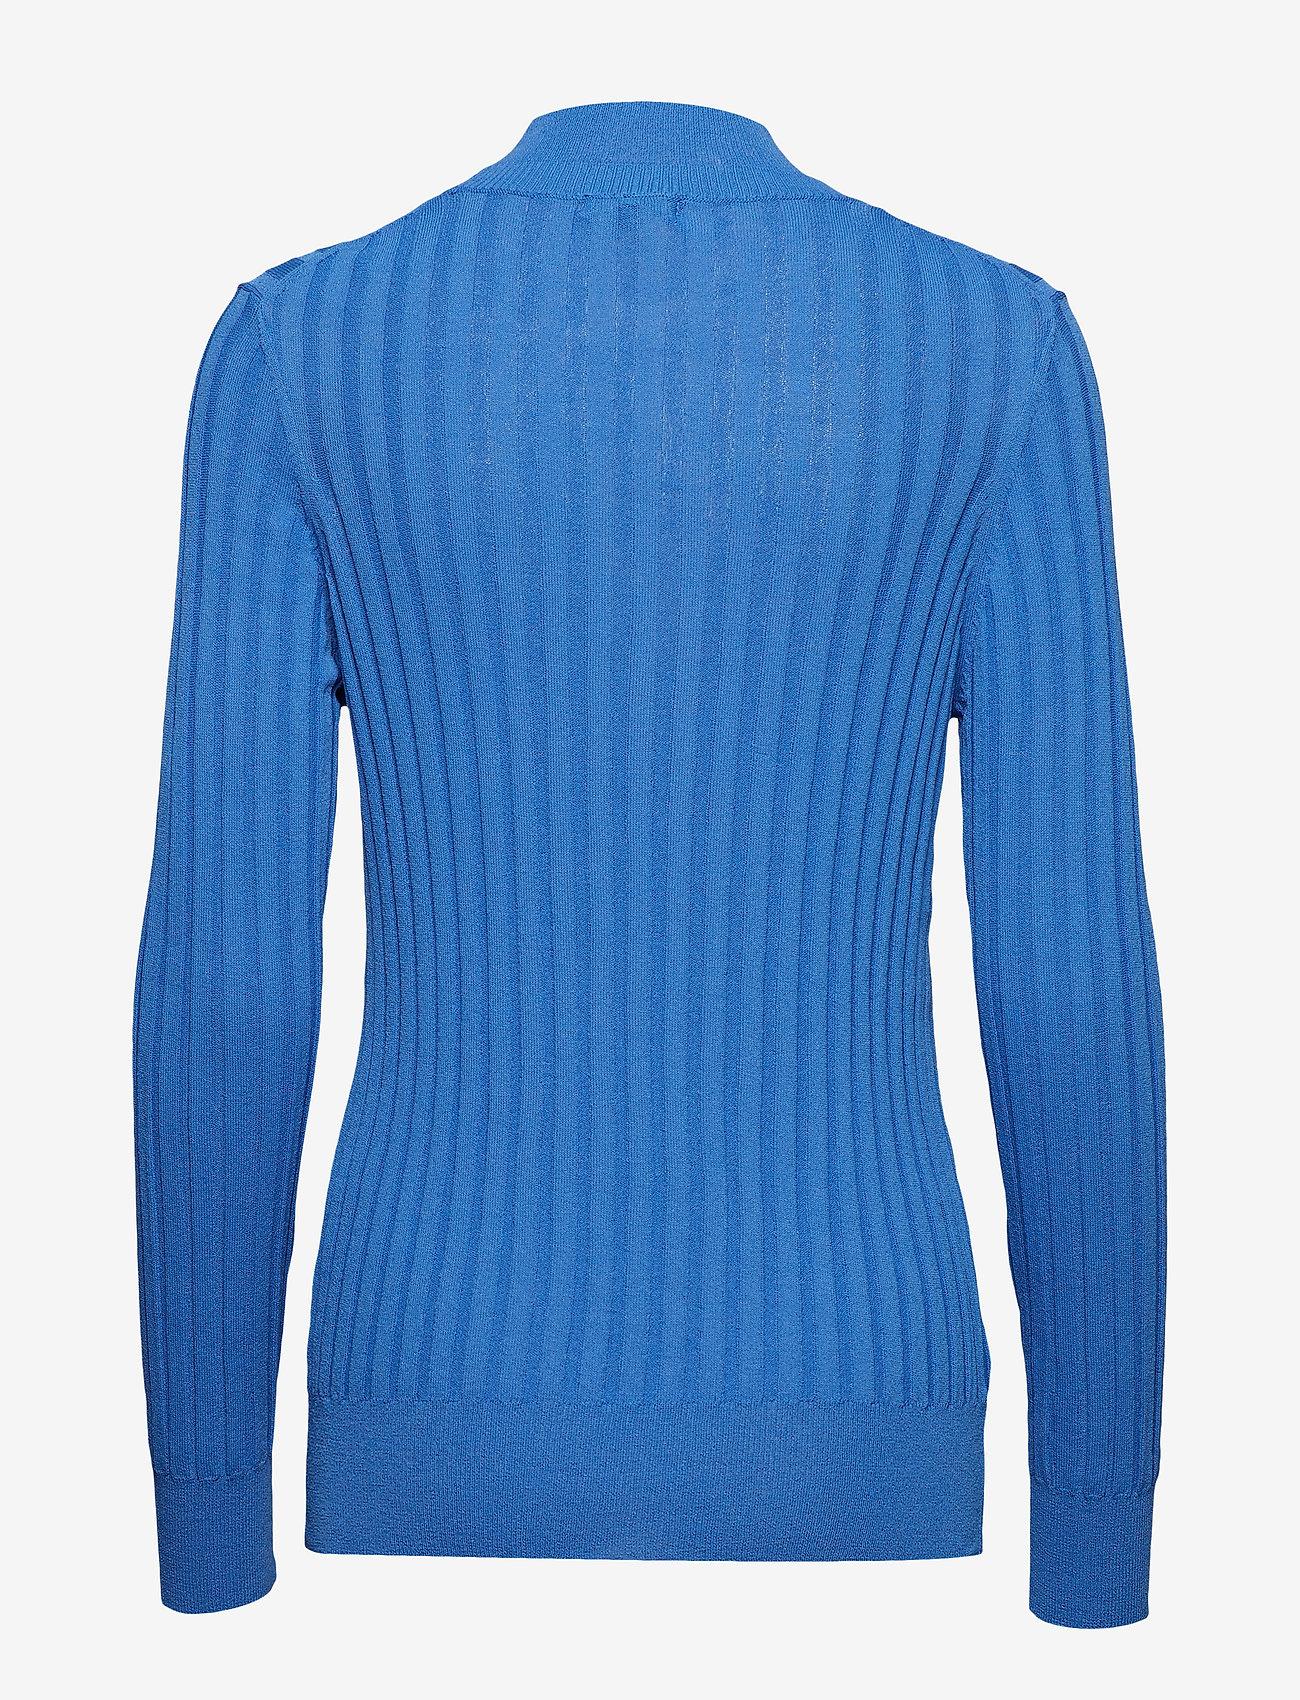 Dagmar Laura - Knitwear SKY BLUE